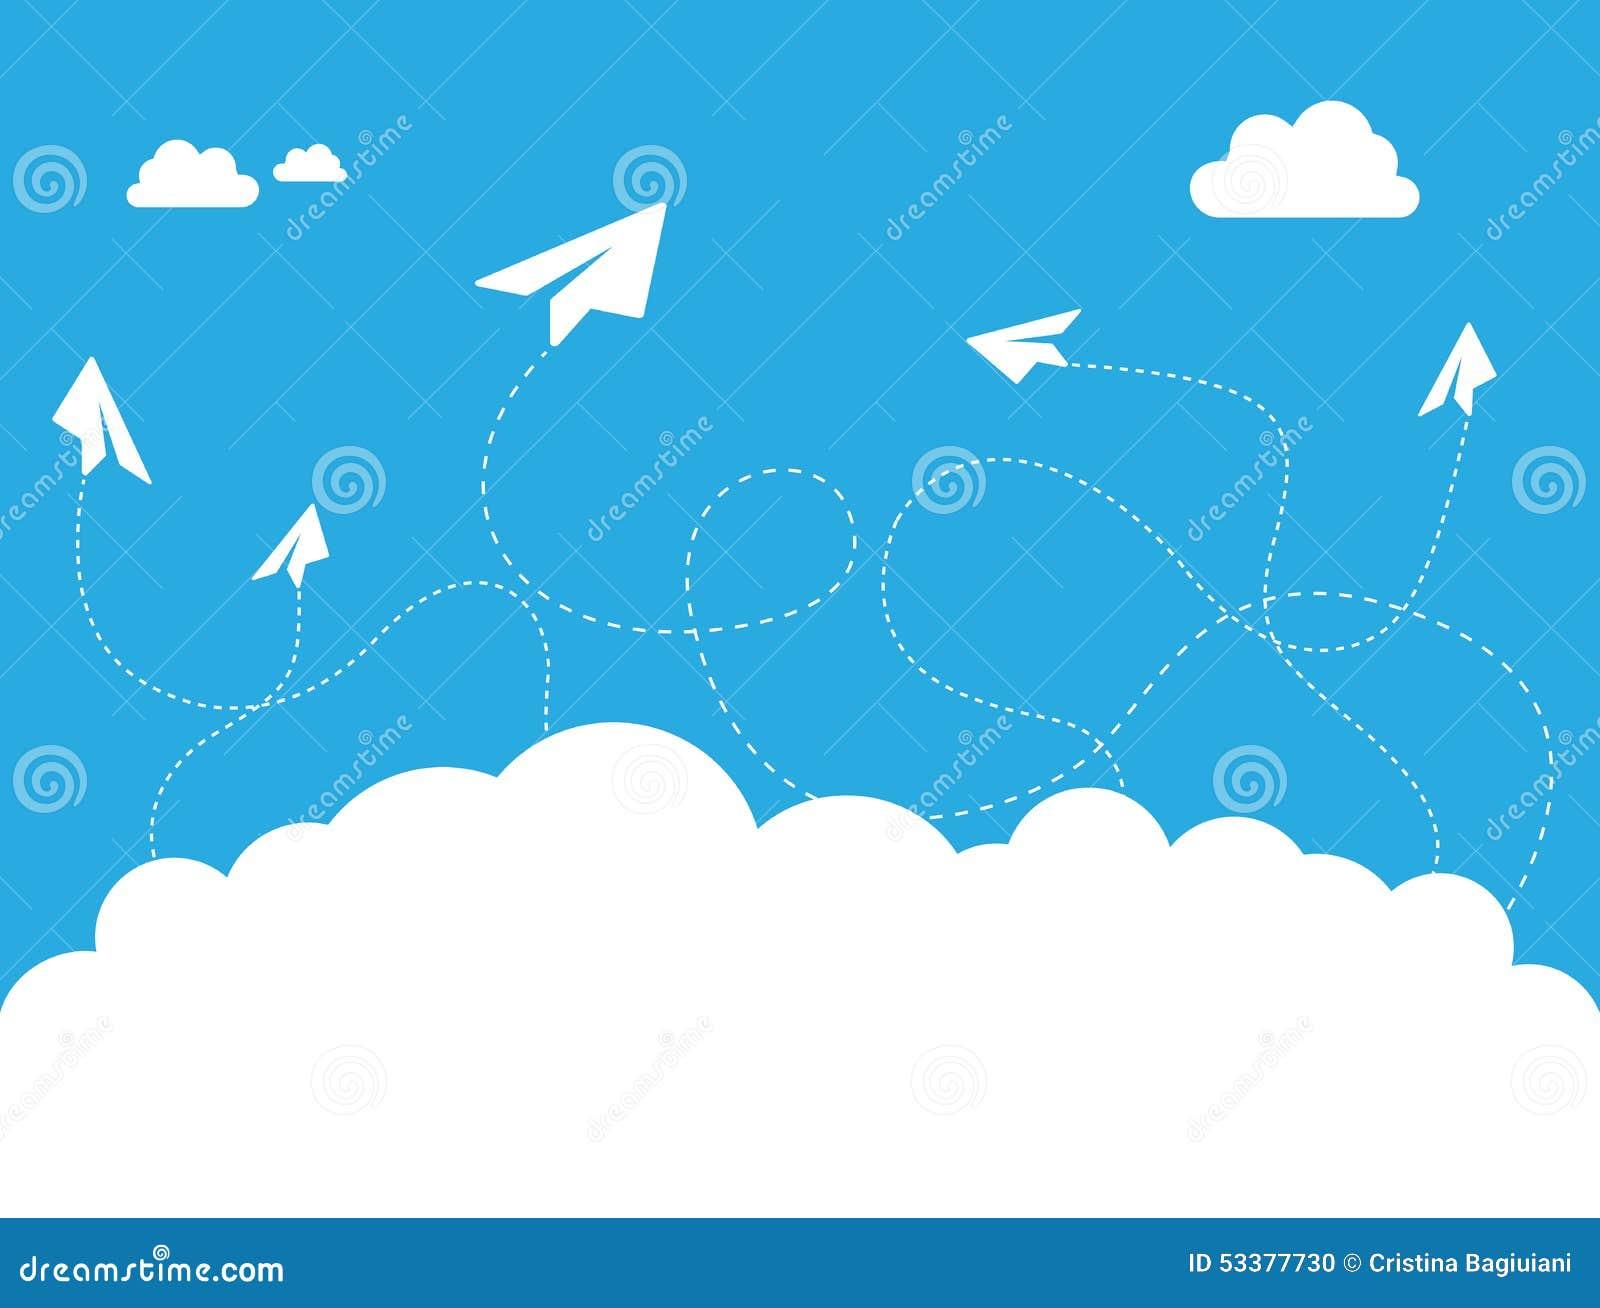 paper plane stock illustration - photo #29